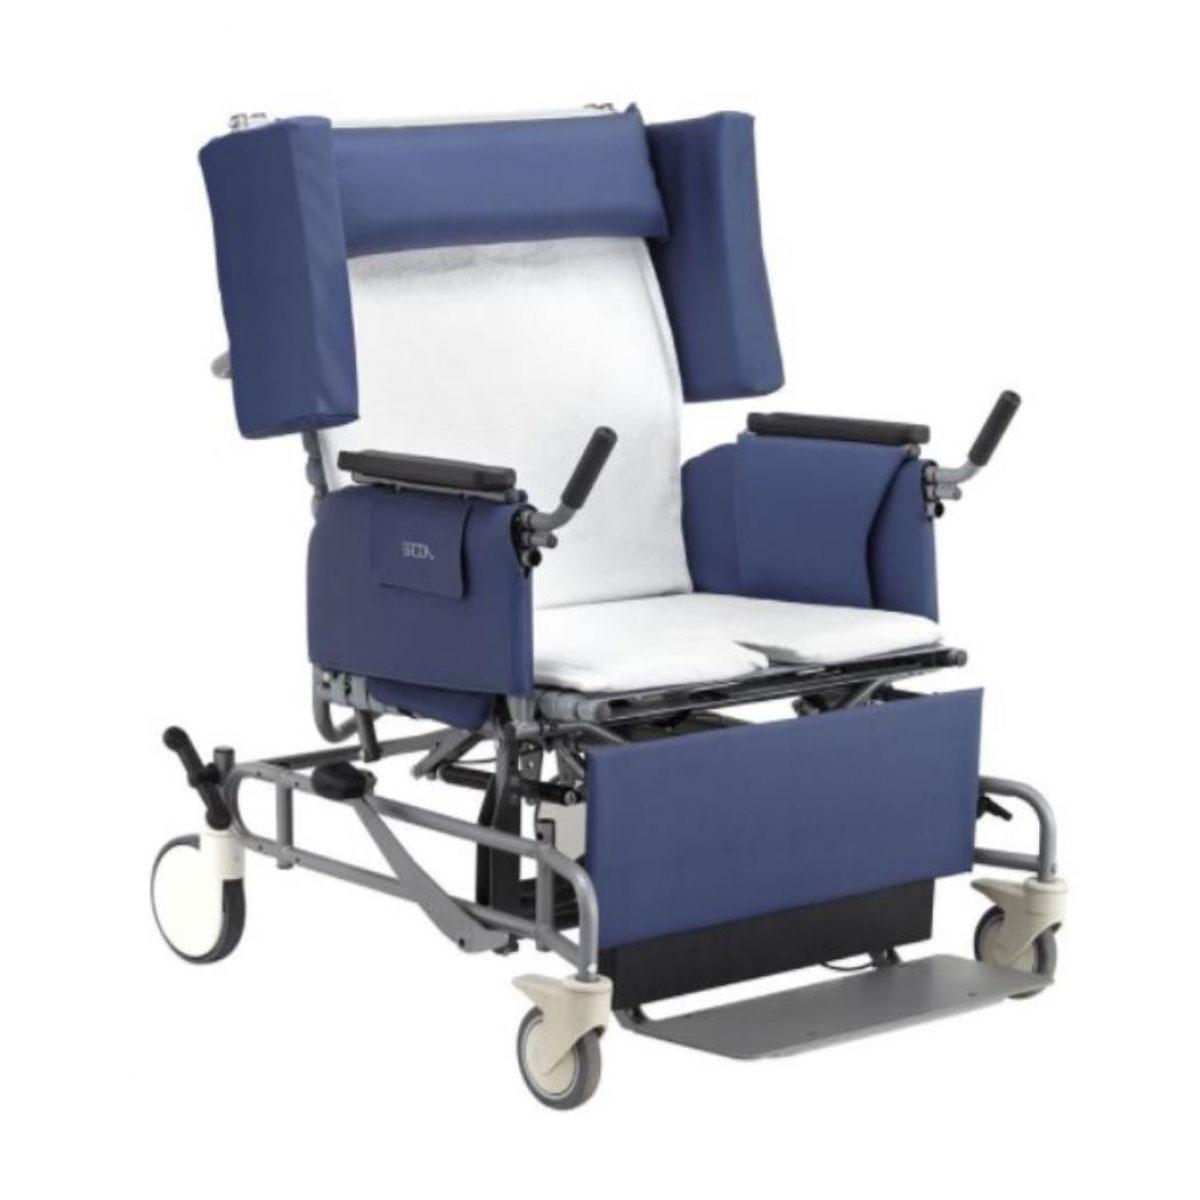 Broda elite vanguard bariatric tilt recliner chair, model 985